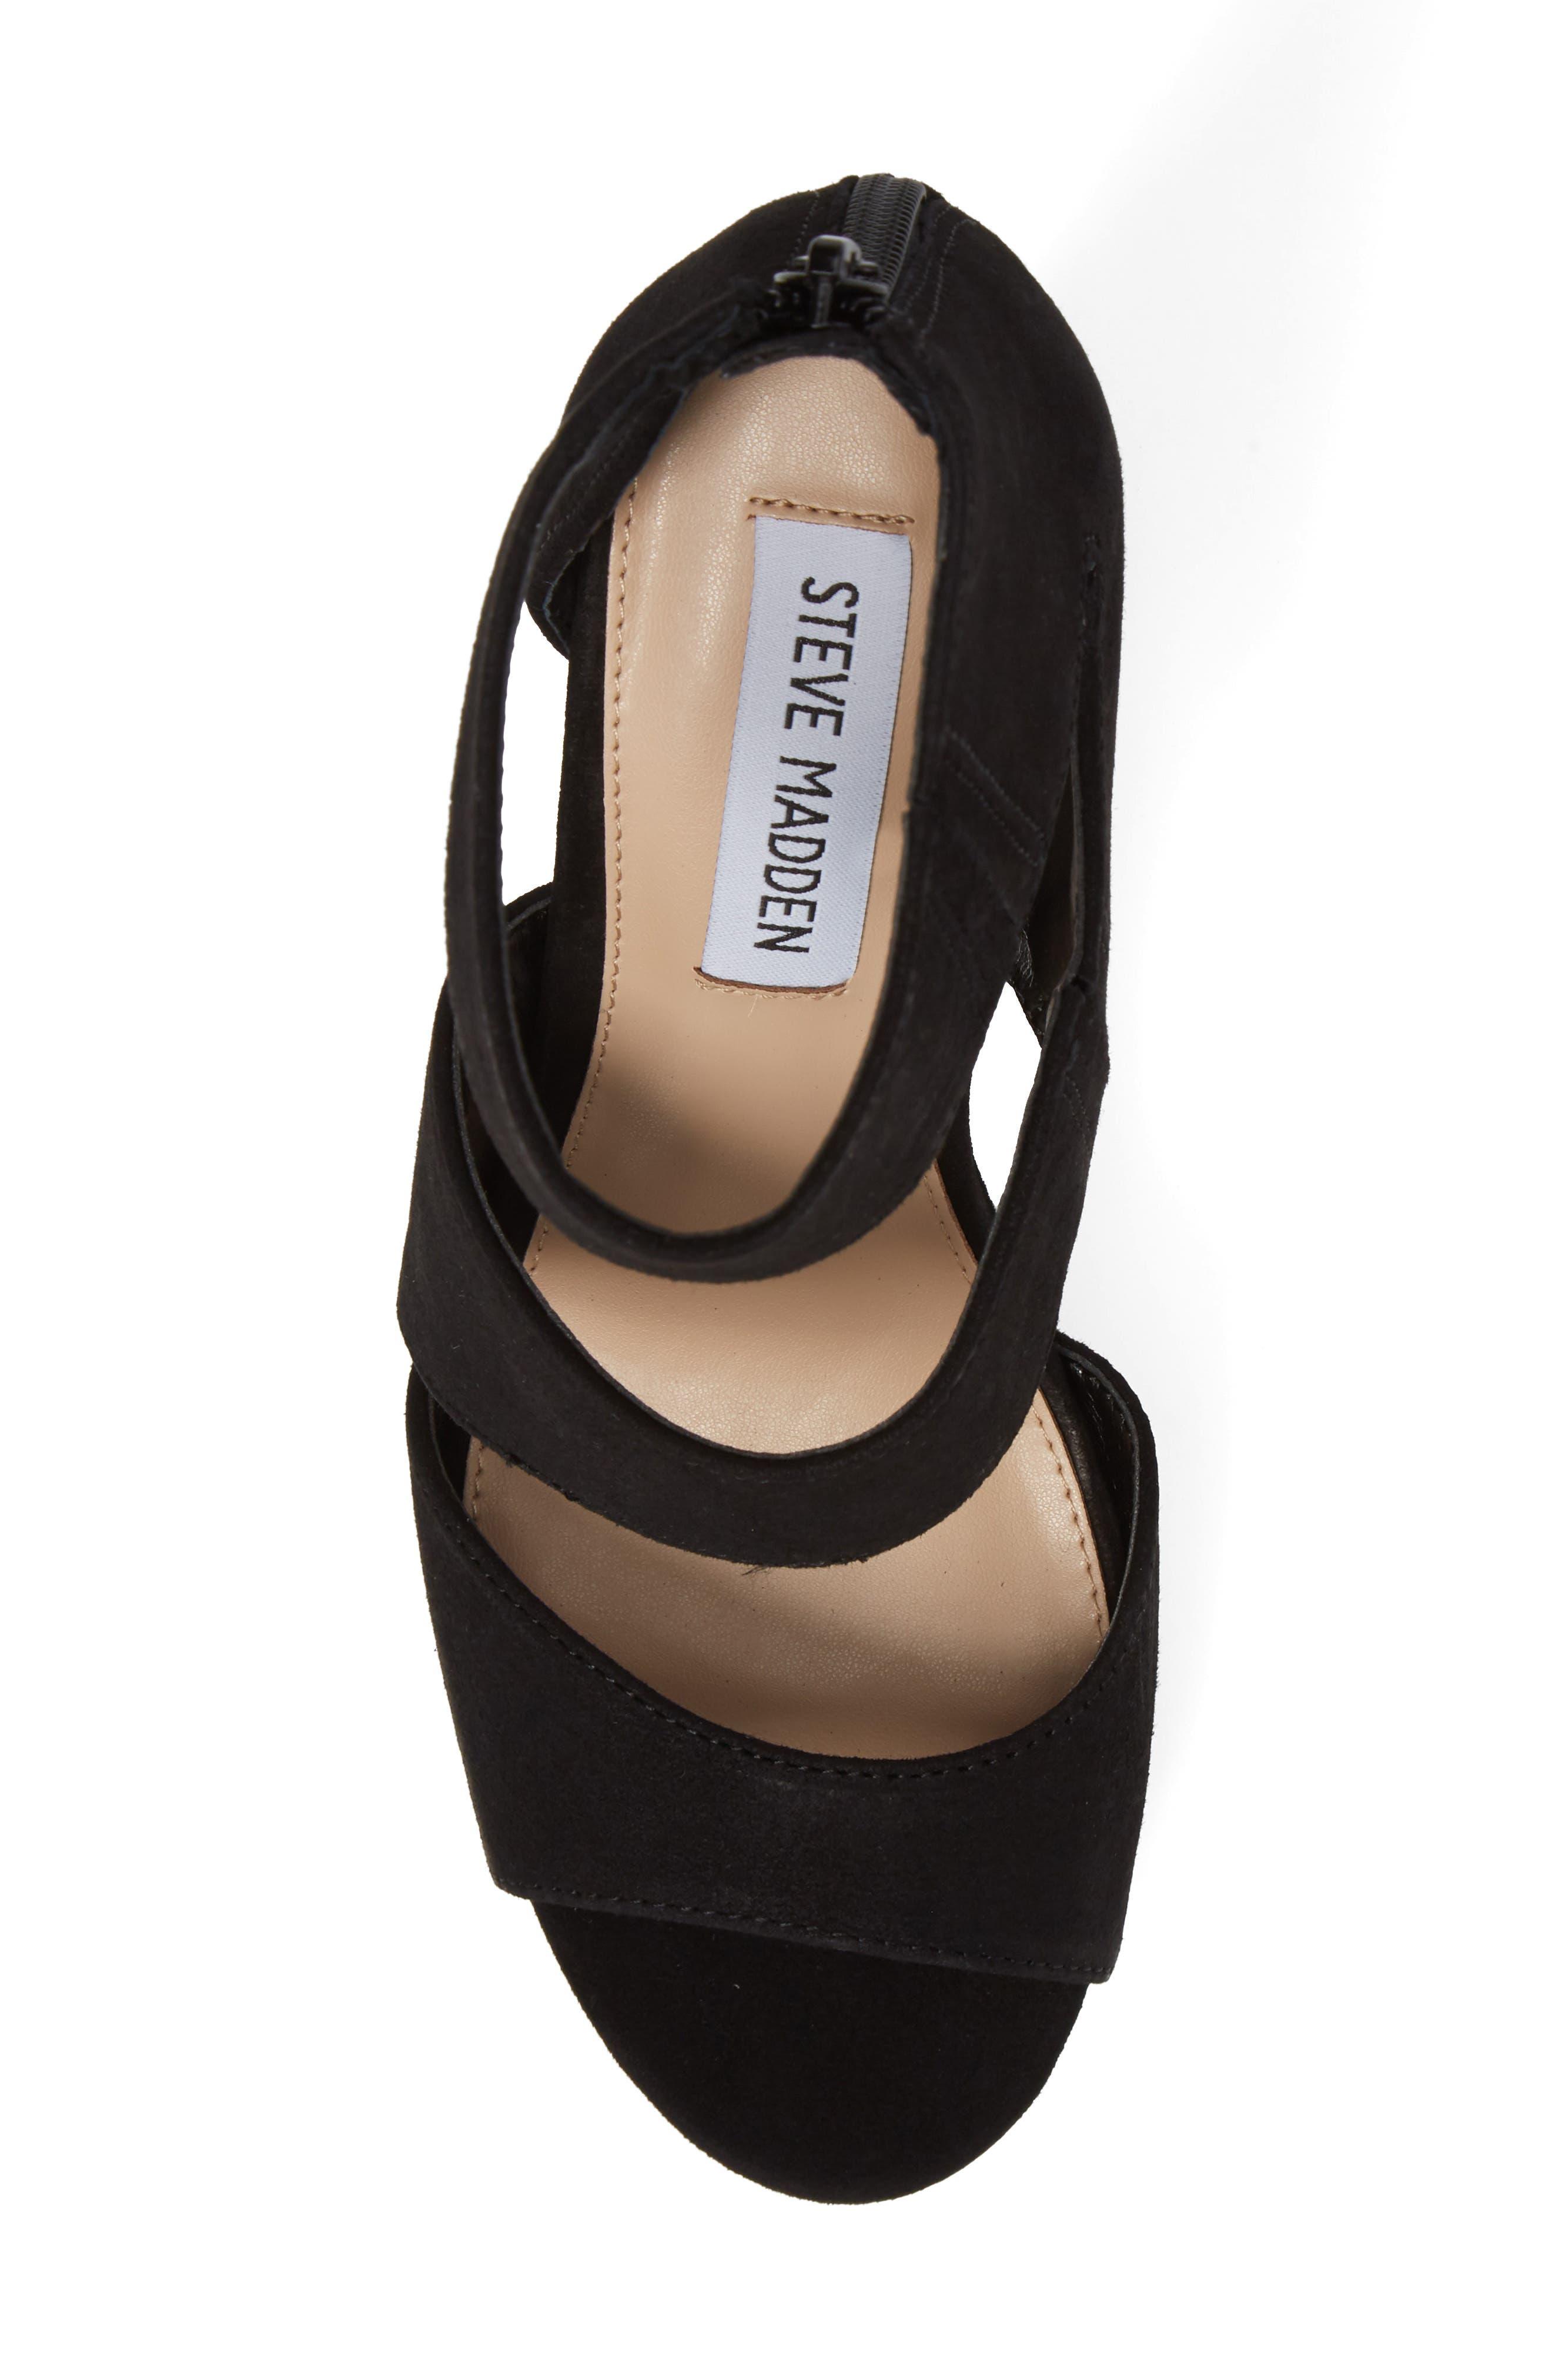 Essey Asymmetrical Platform Wedge Sandal,                             Alternate thumbnail 5, color,                             006